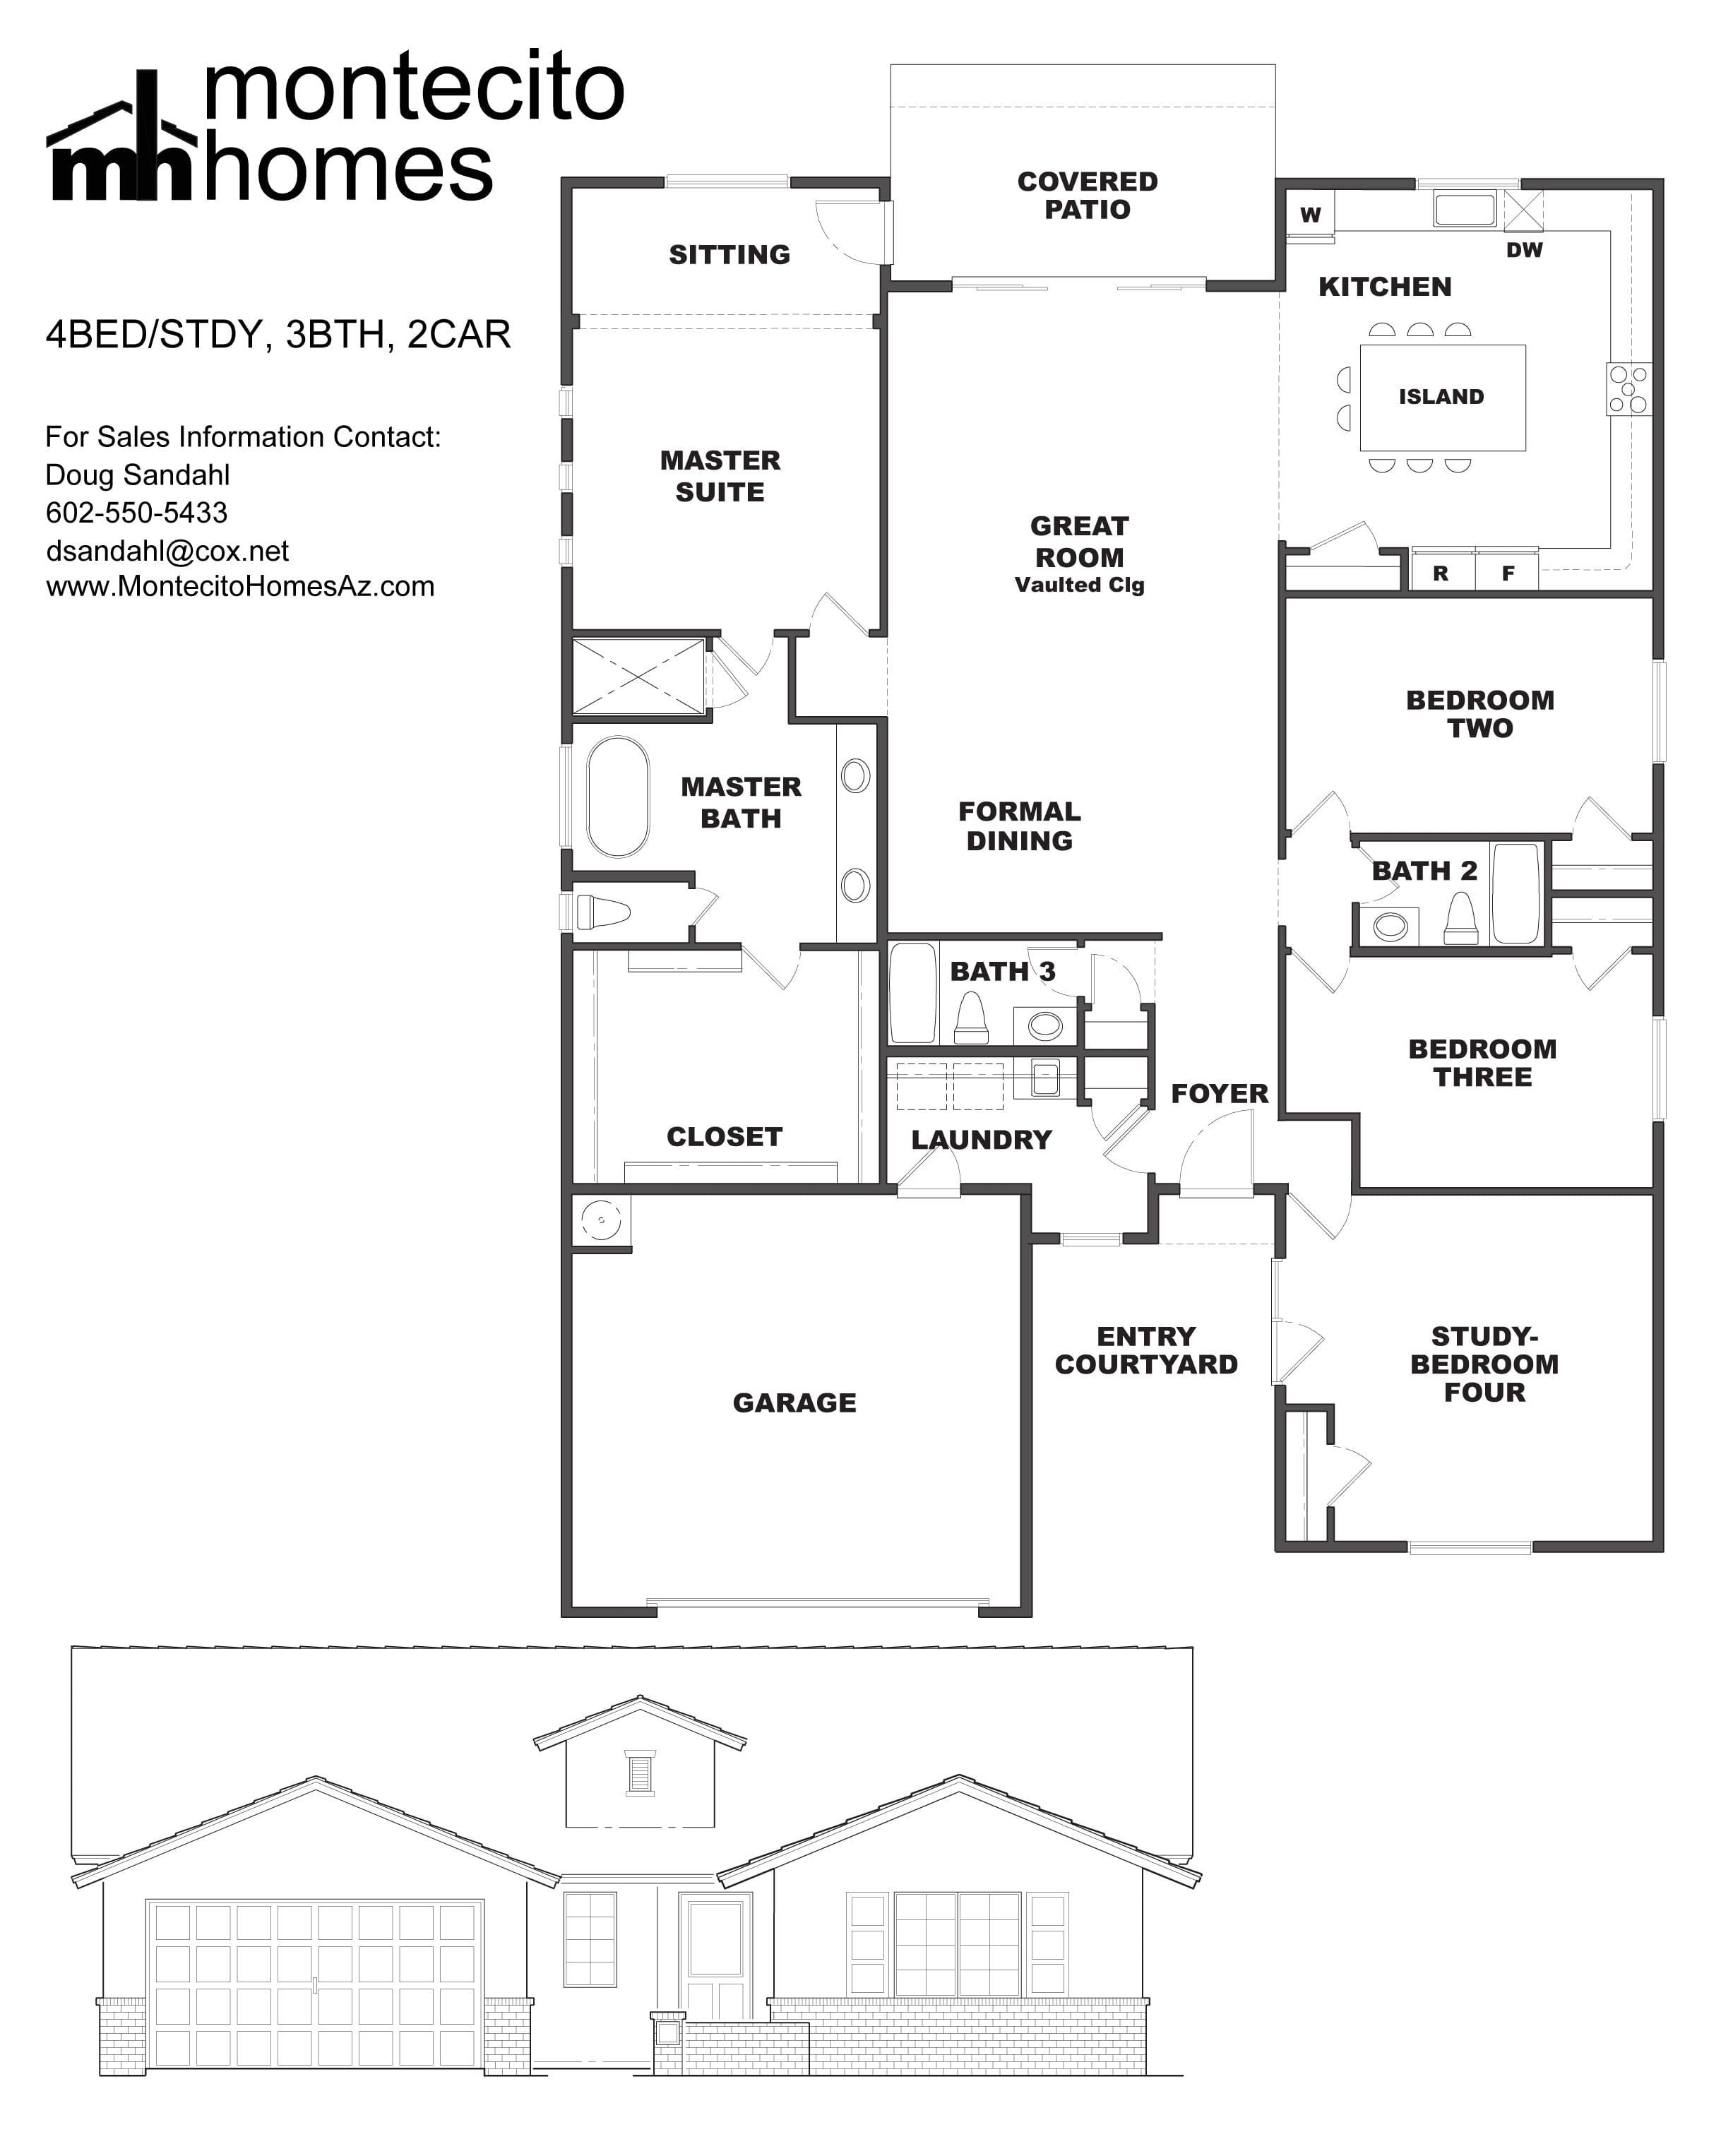 Montecito Homes Floorplan